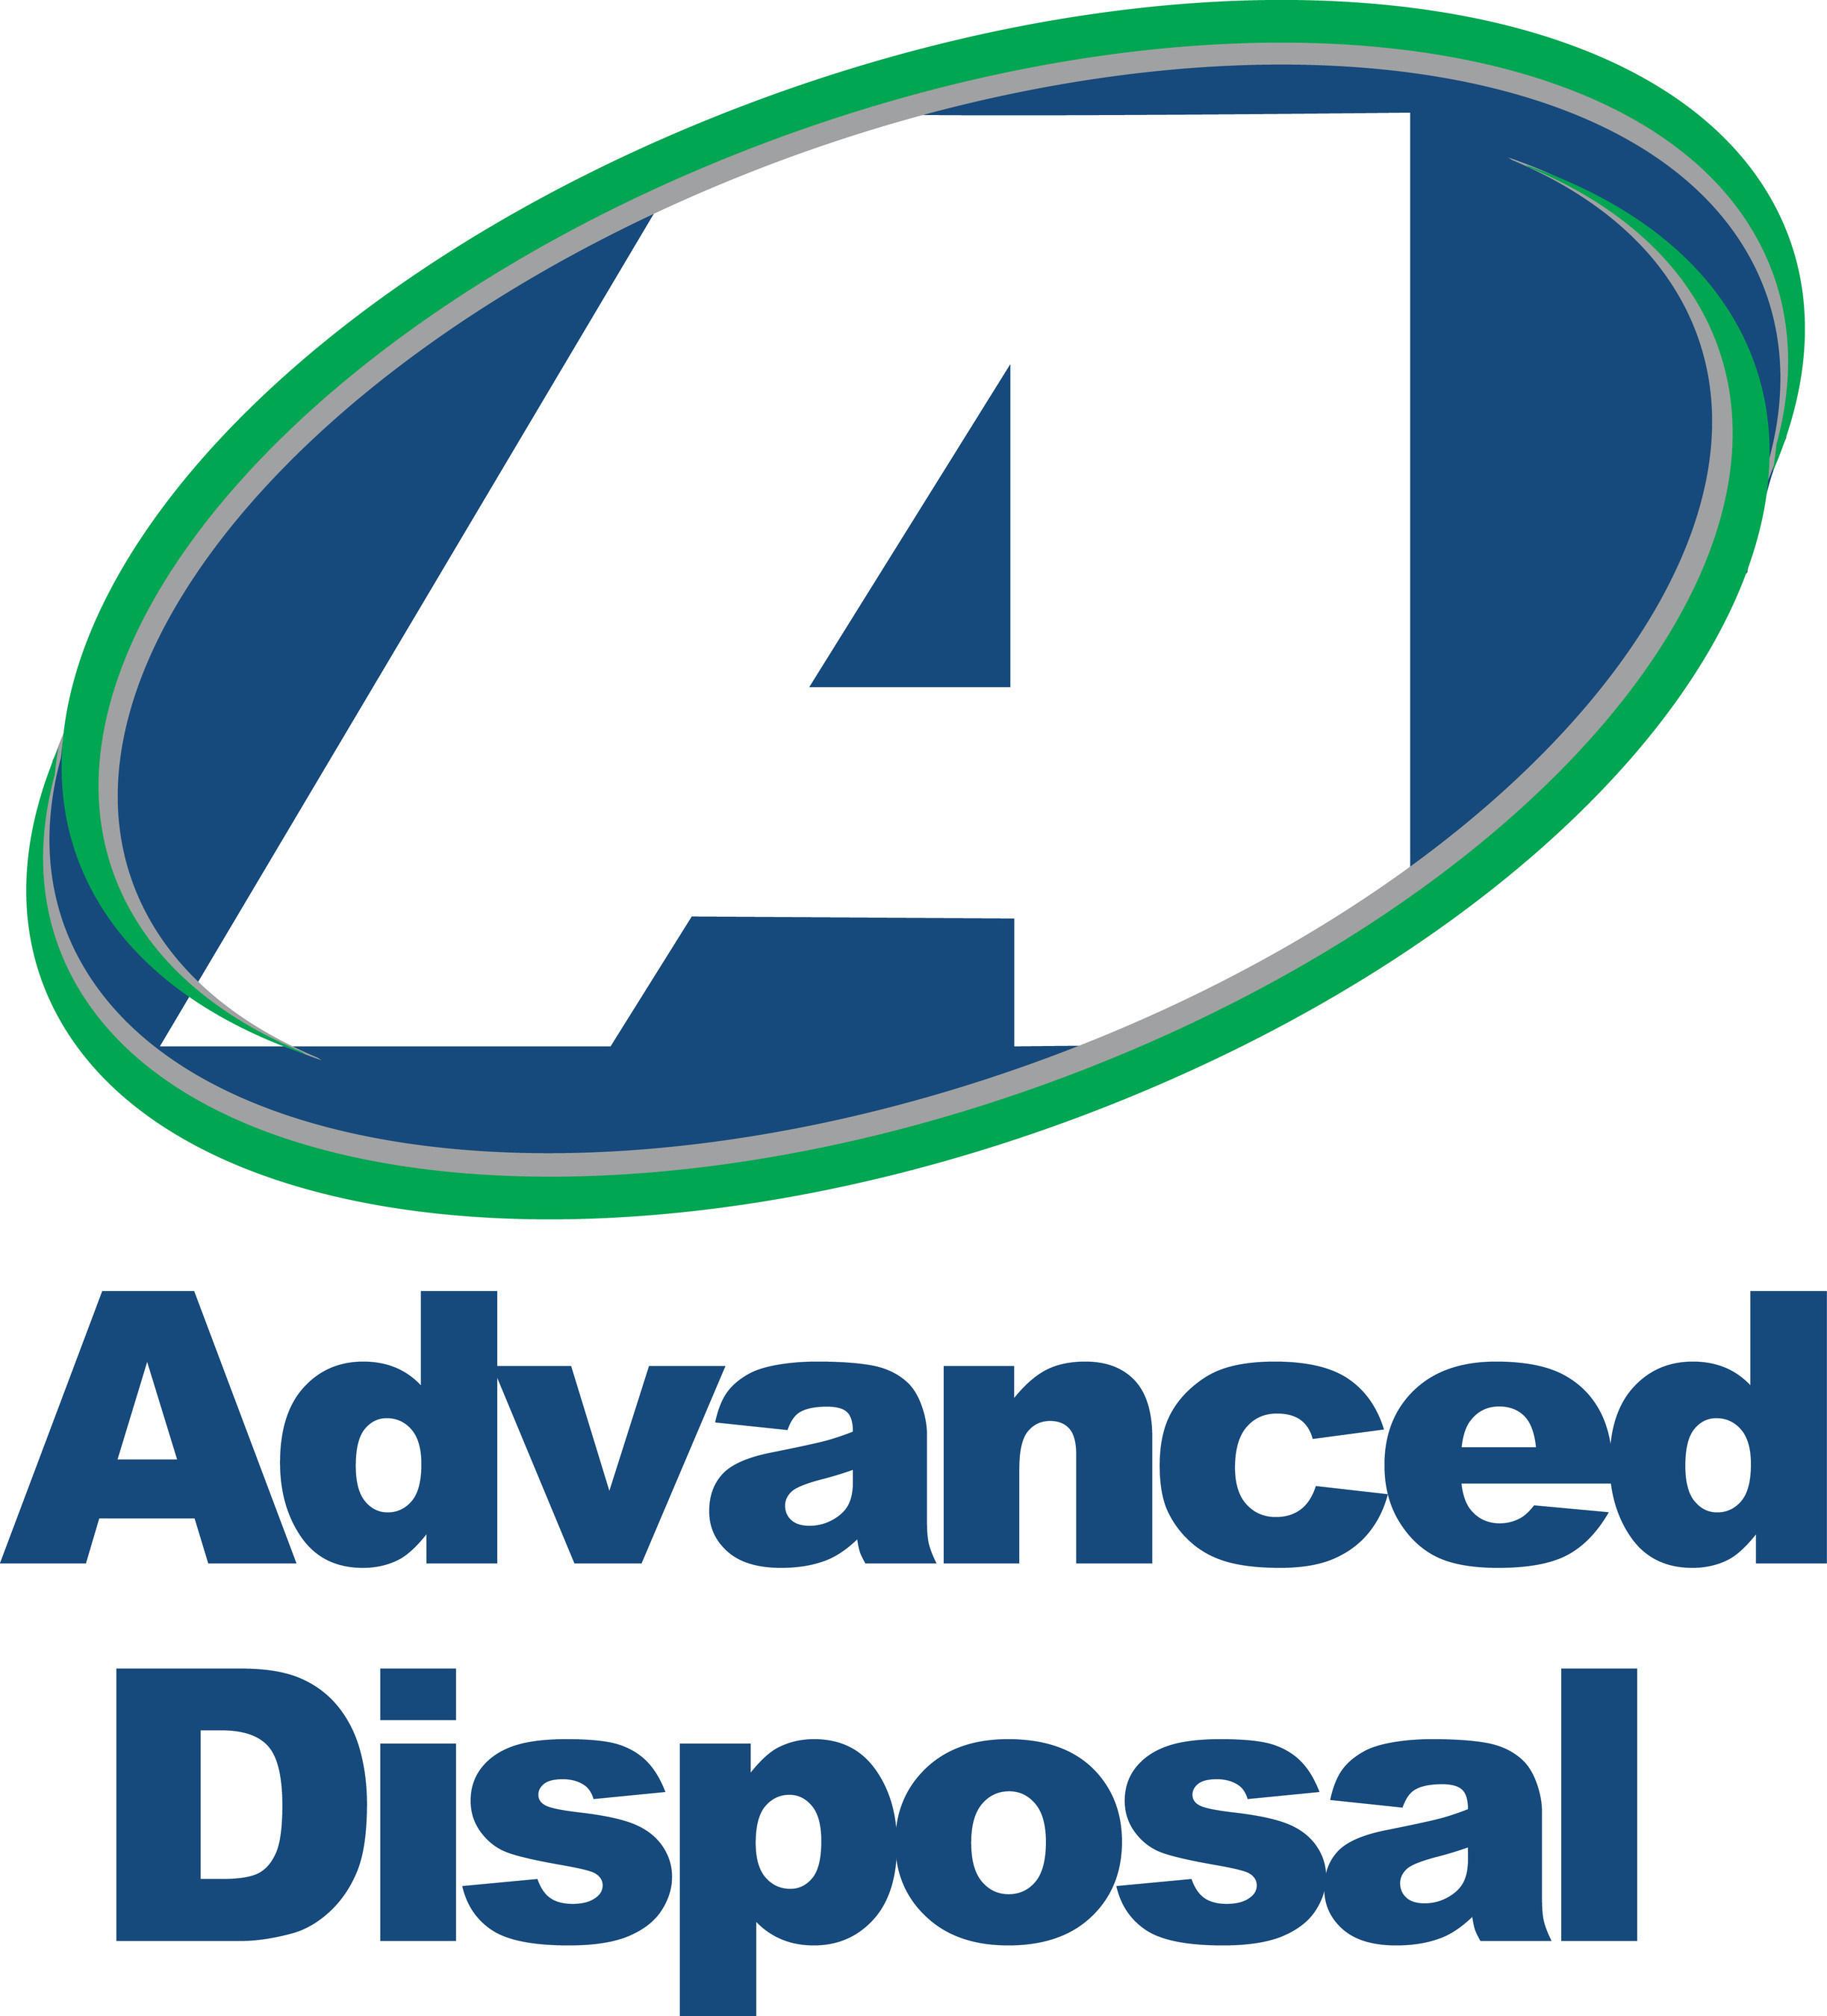 Advanced Disposal - Vertical 4C Logo